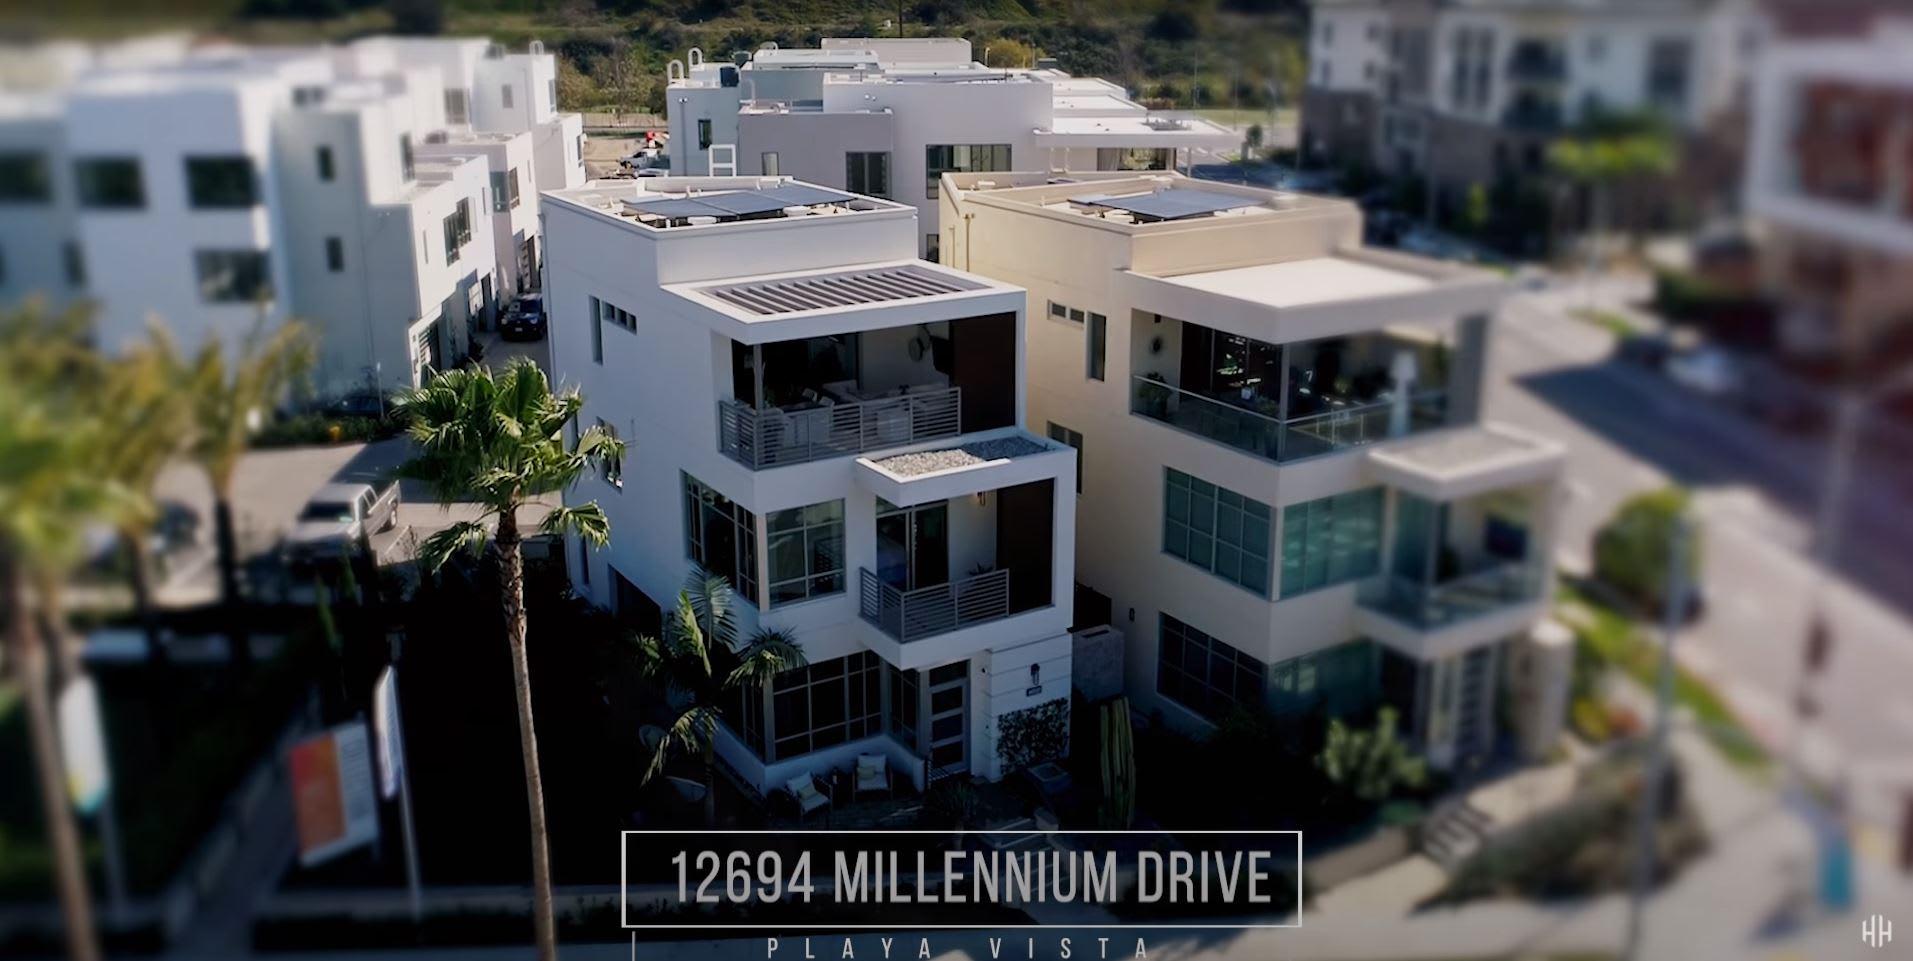 12694 Millennium Drive | Playa Vista video preview